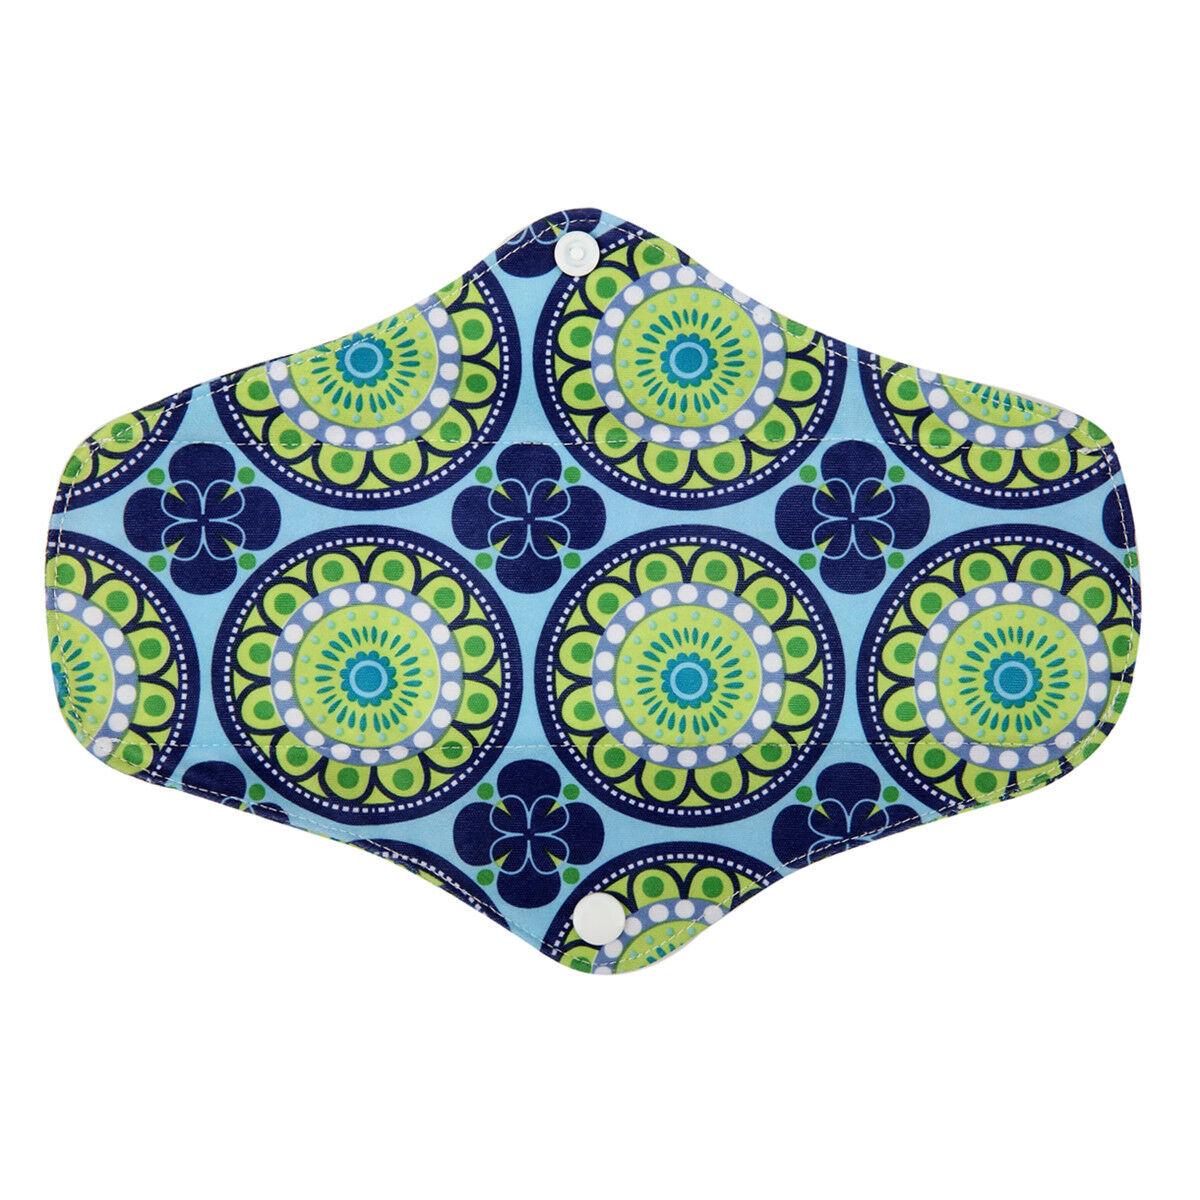 XS S M L XL Cloth Menstrual Pad Mama Cloth Sanitary Bamboo Charcoal Bag Reusable